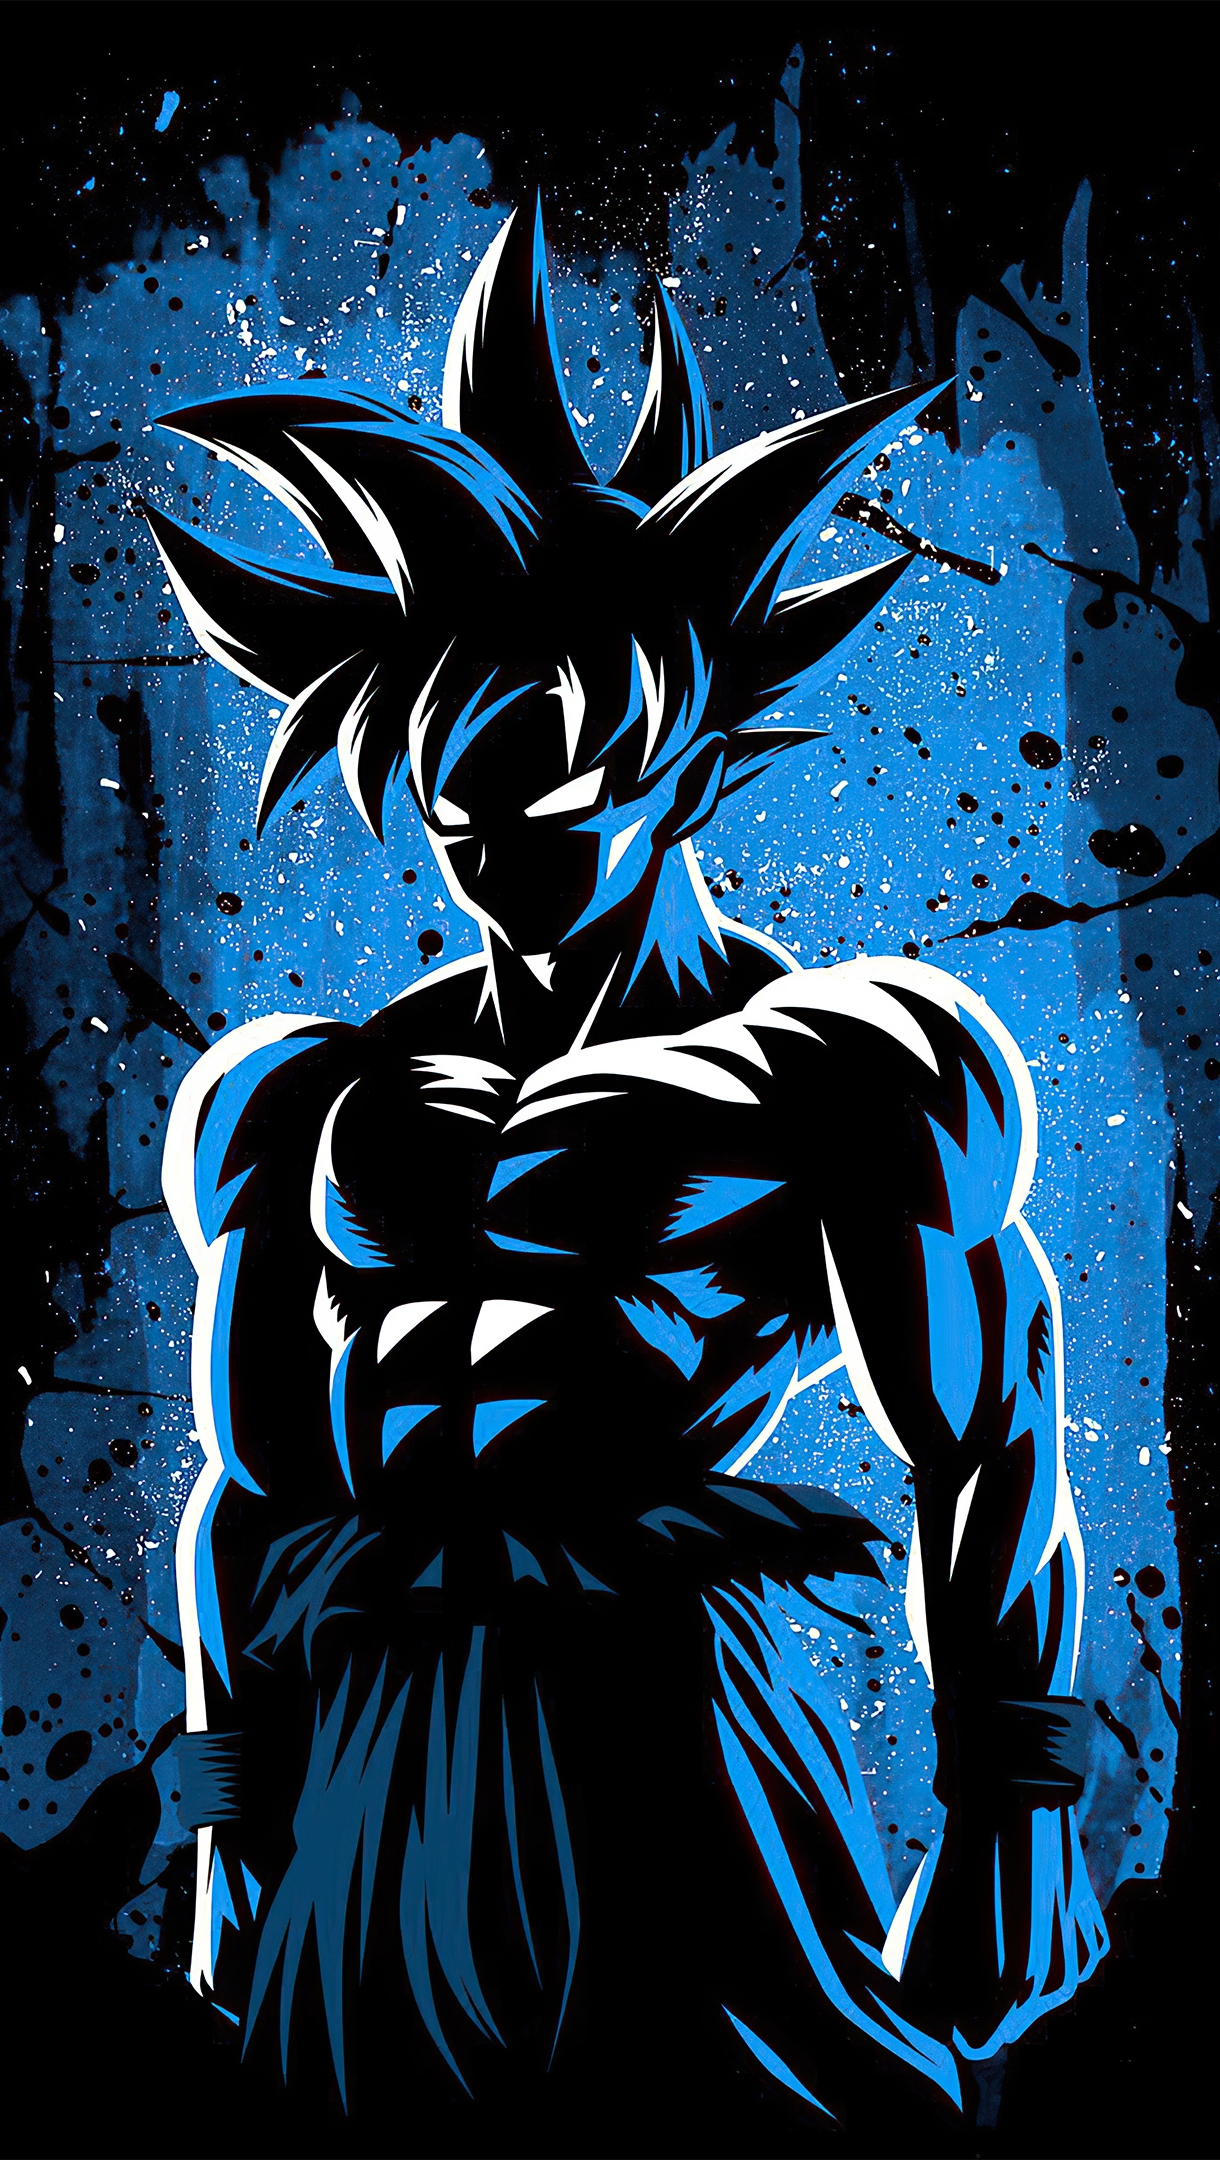 Fondos de pantalla Anime Goku diseño minimalista 2020 Vertical